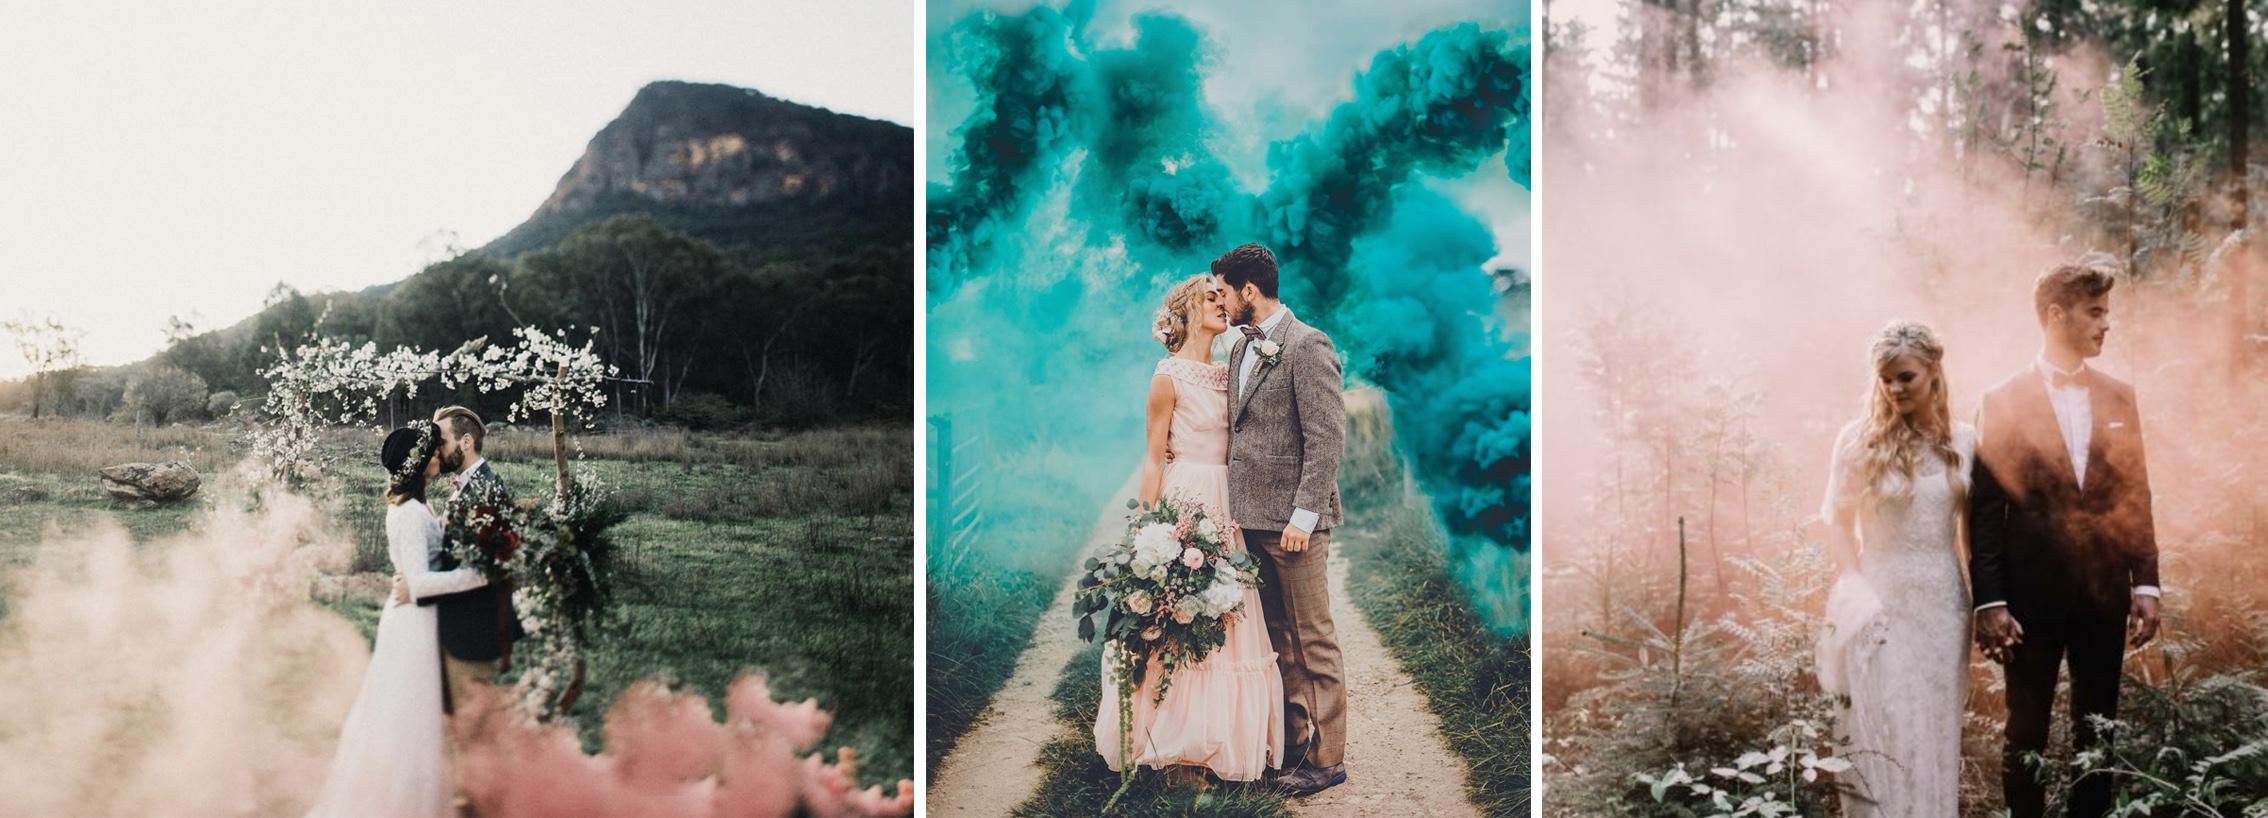 Right Image: Joshua Mikhaiel Middle Image: Poppy Carter Portraits Left Image: Pinterst